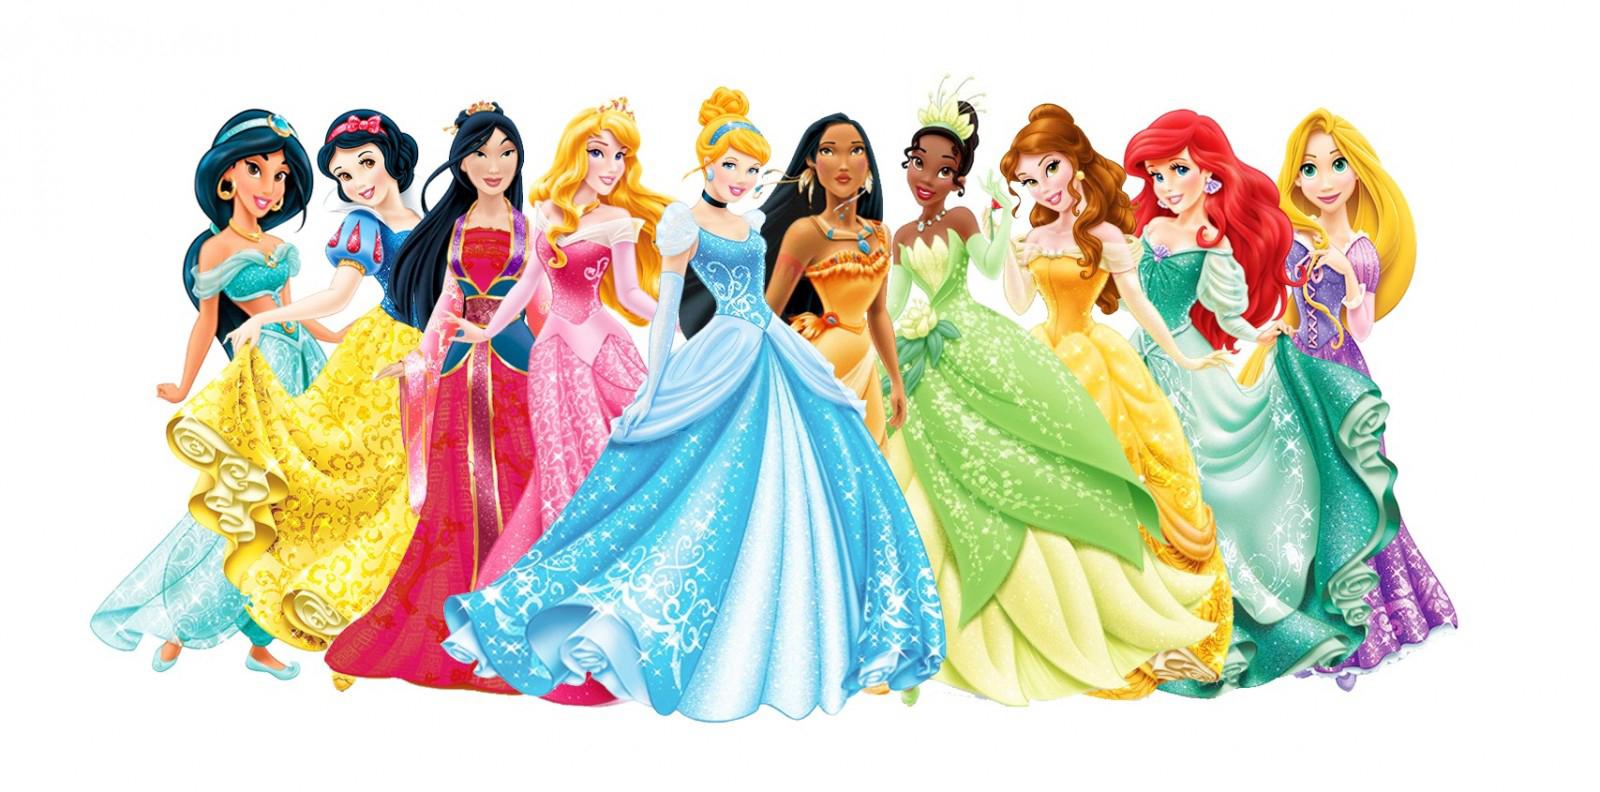 Dibujos Para Colorear De Disney Channel Para Imprimir: Dibujos De Princesas Disney Para Colorear E Imprimir Gratis